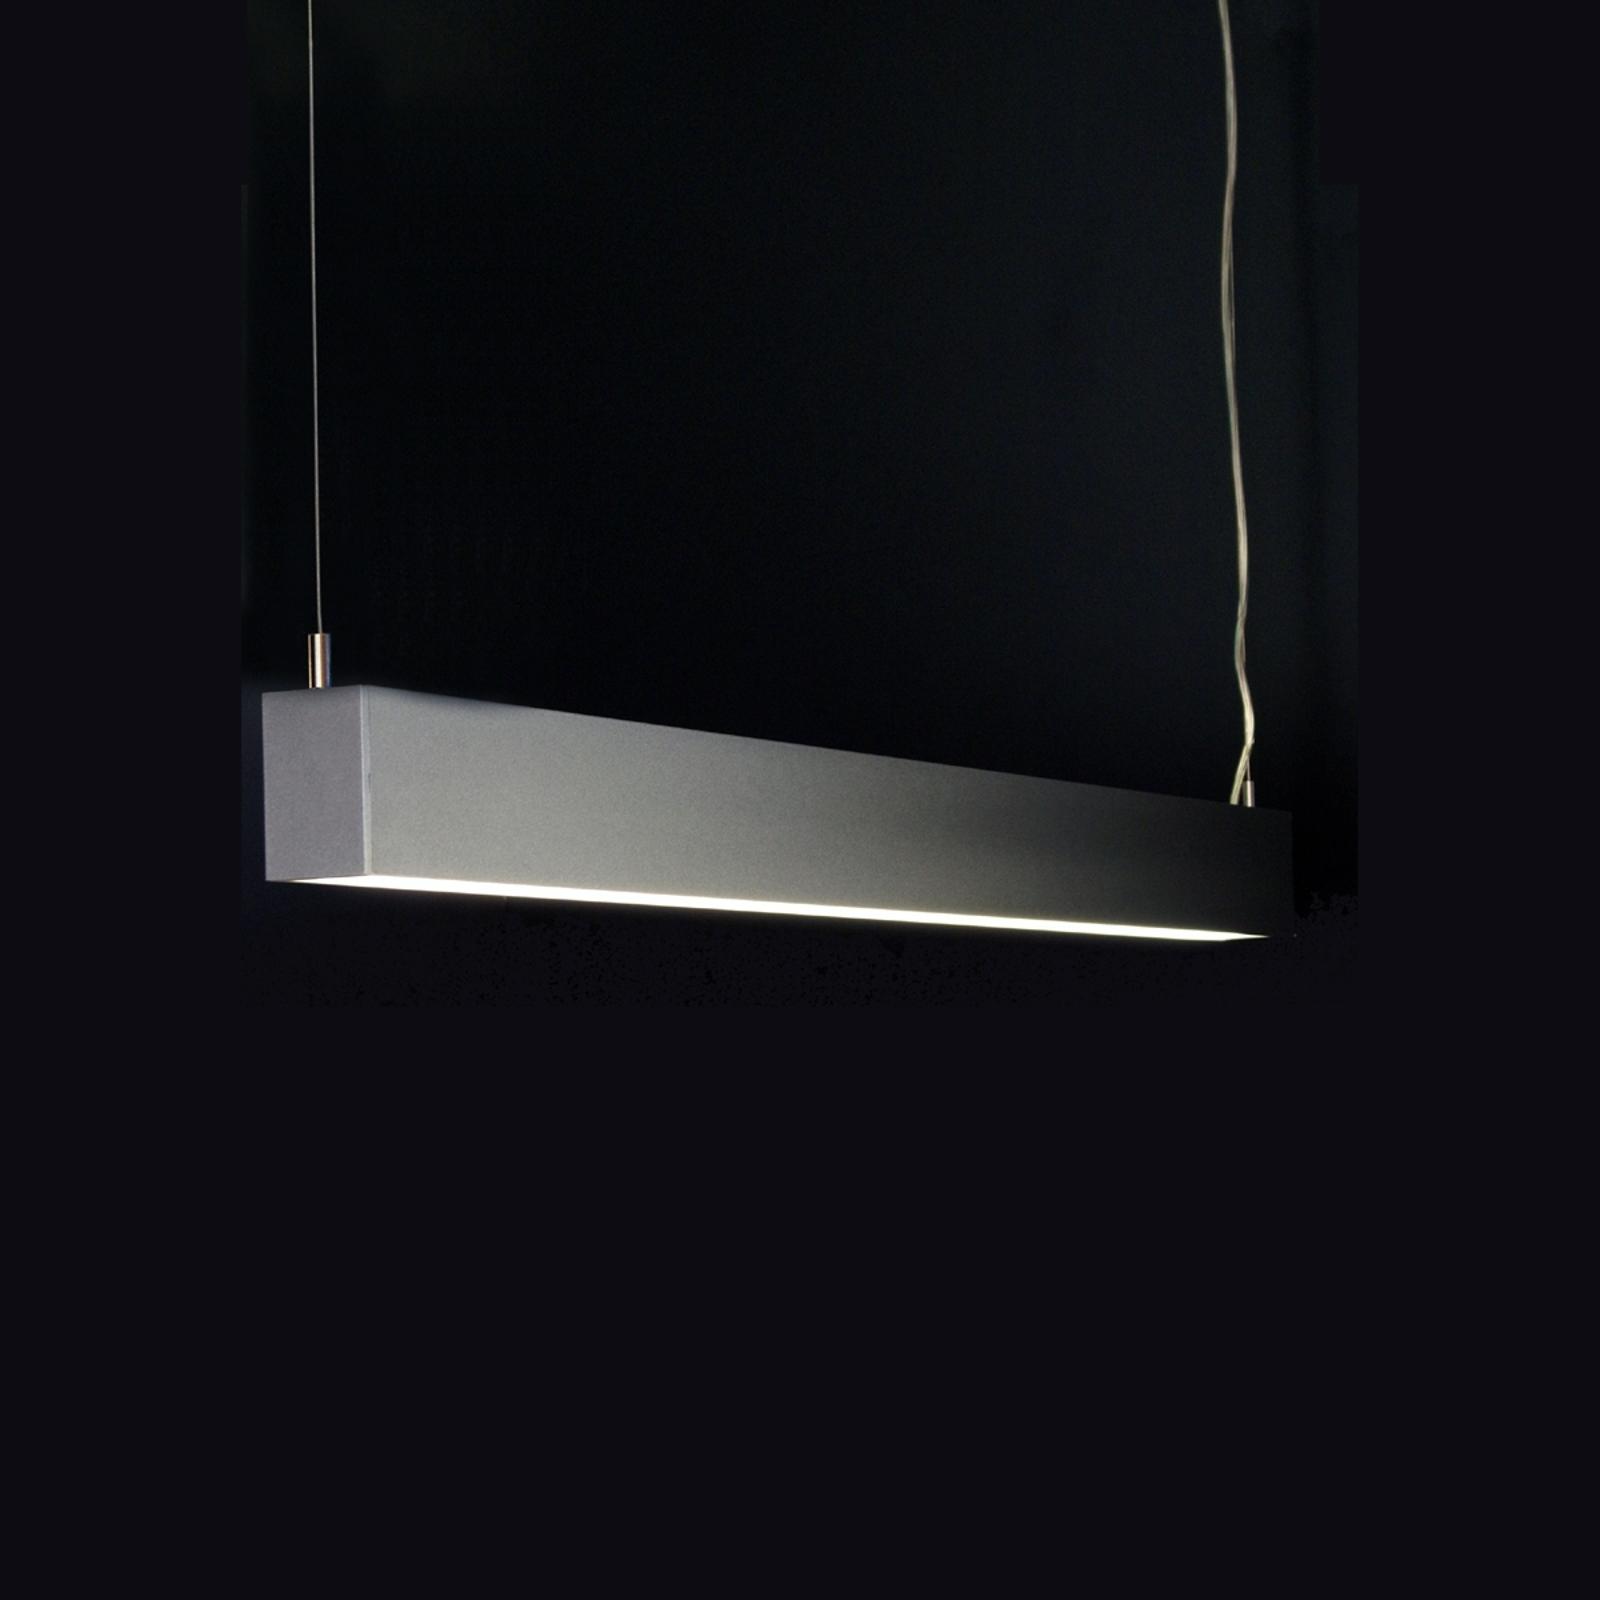 Modernin Tin-riippuvalaisimen pituus 89,8 cm